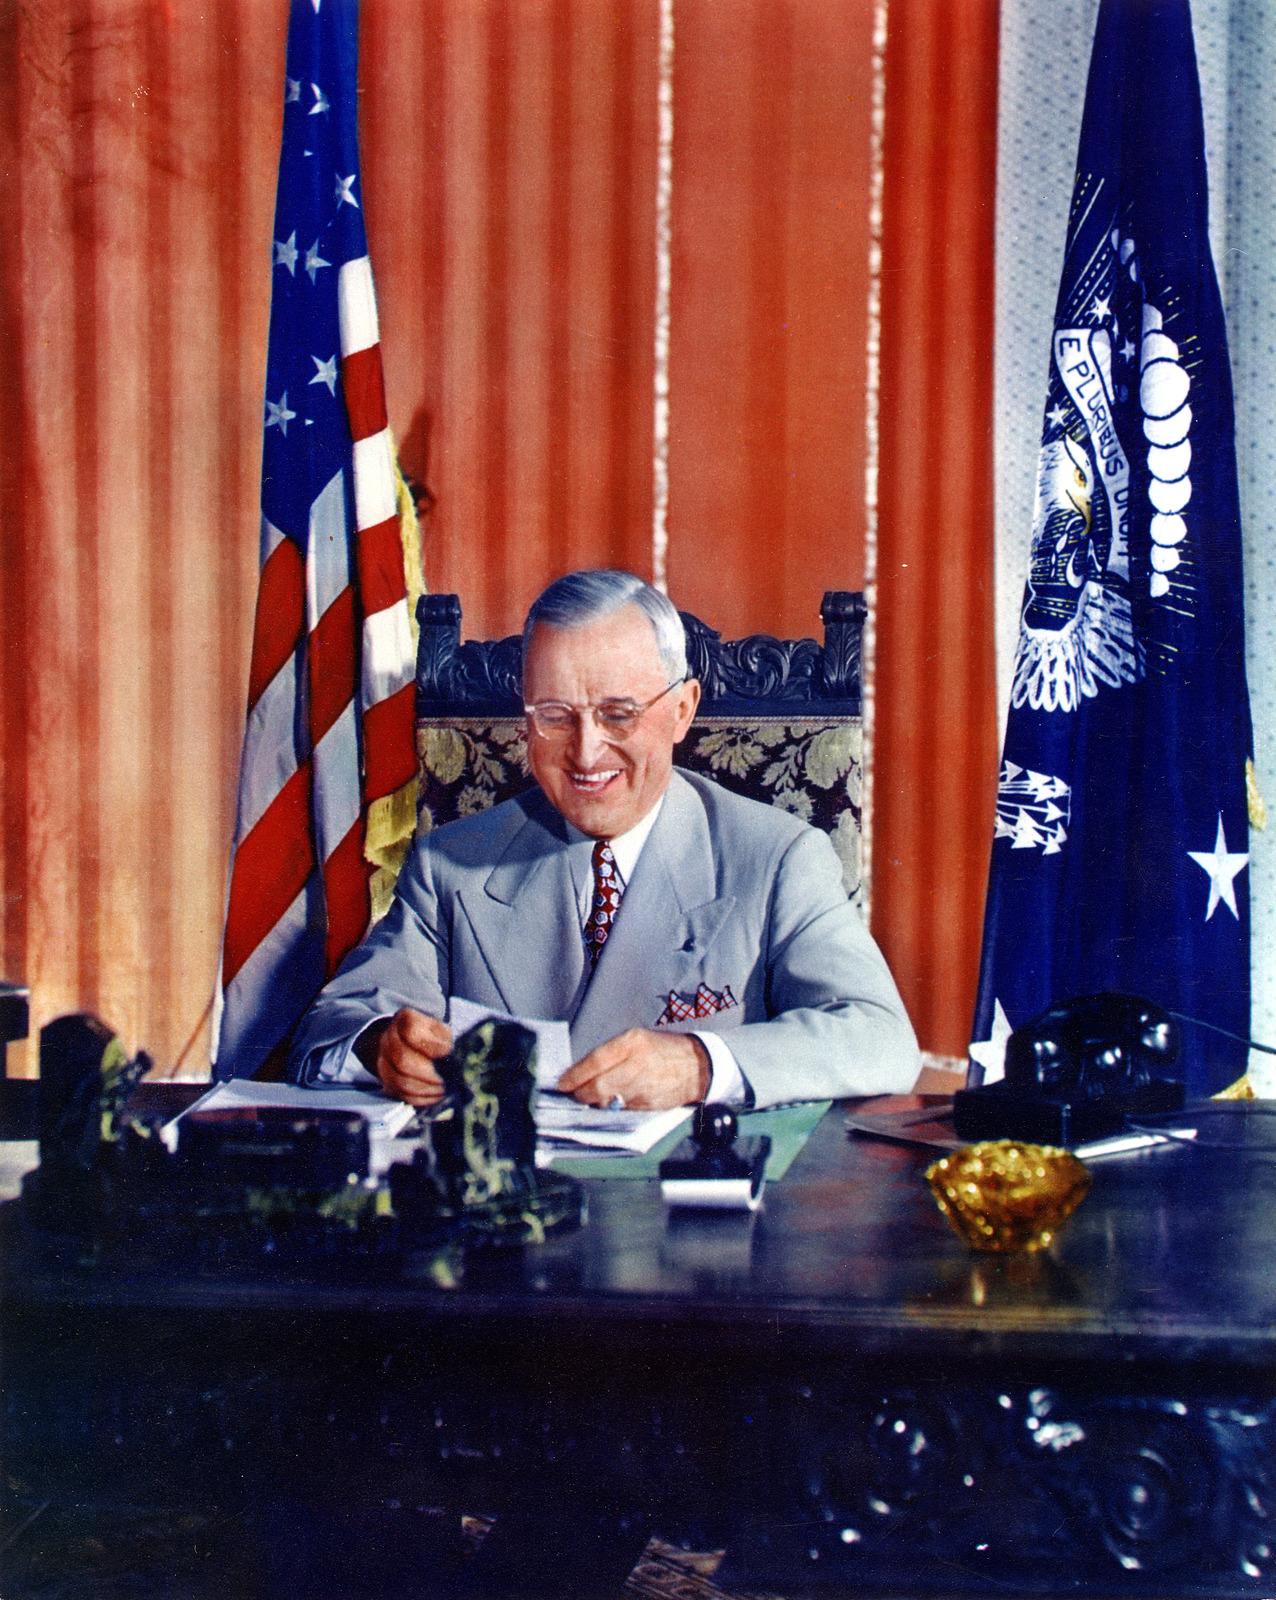 Portrait of President Harry S. Truman at Desk, Grinning